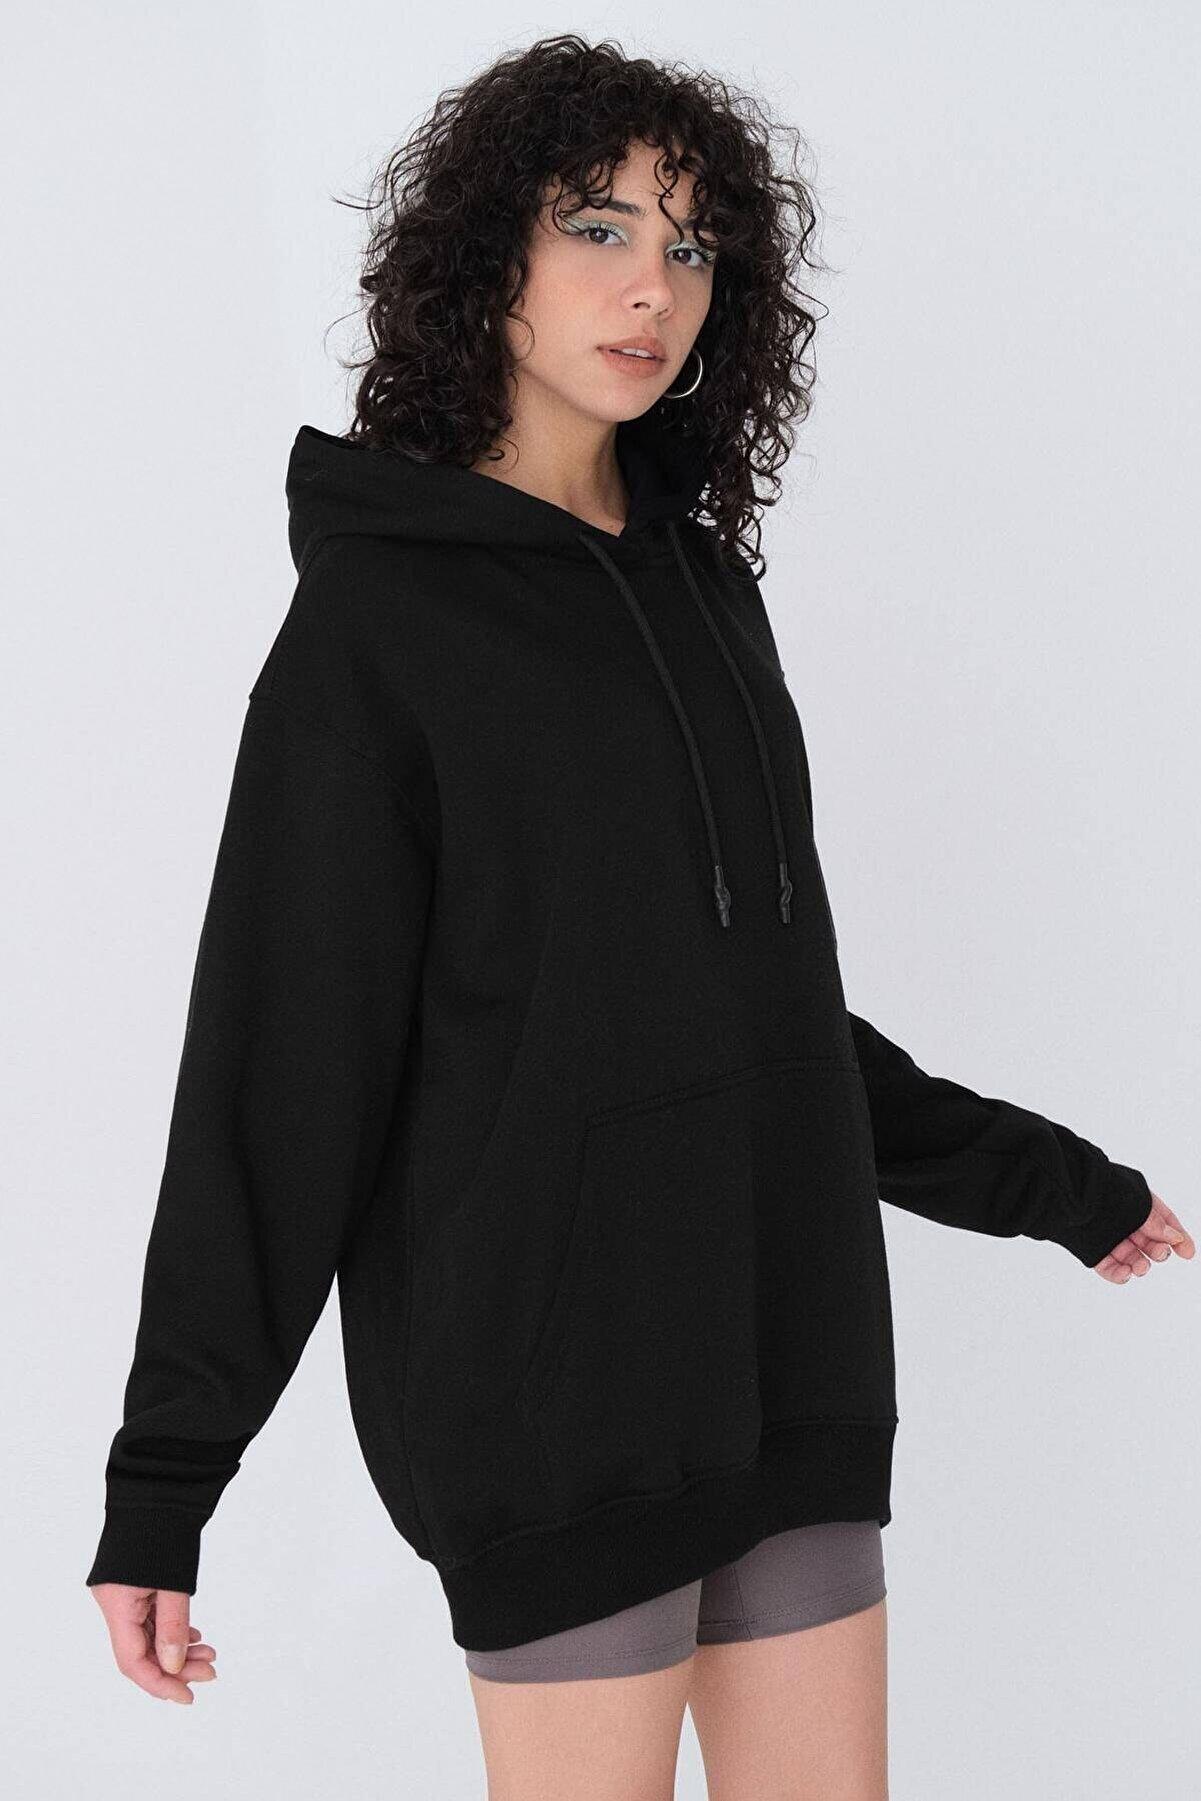 Addax Kadın Siyah Kapüşonlu Oversize Sweat S0925 - N4 - P3 ADX-0000022256